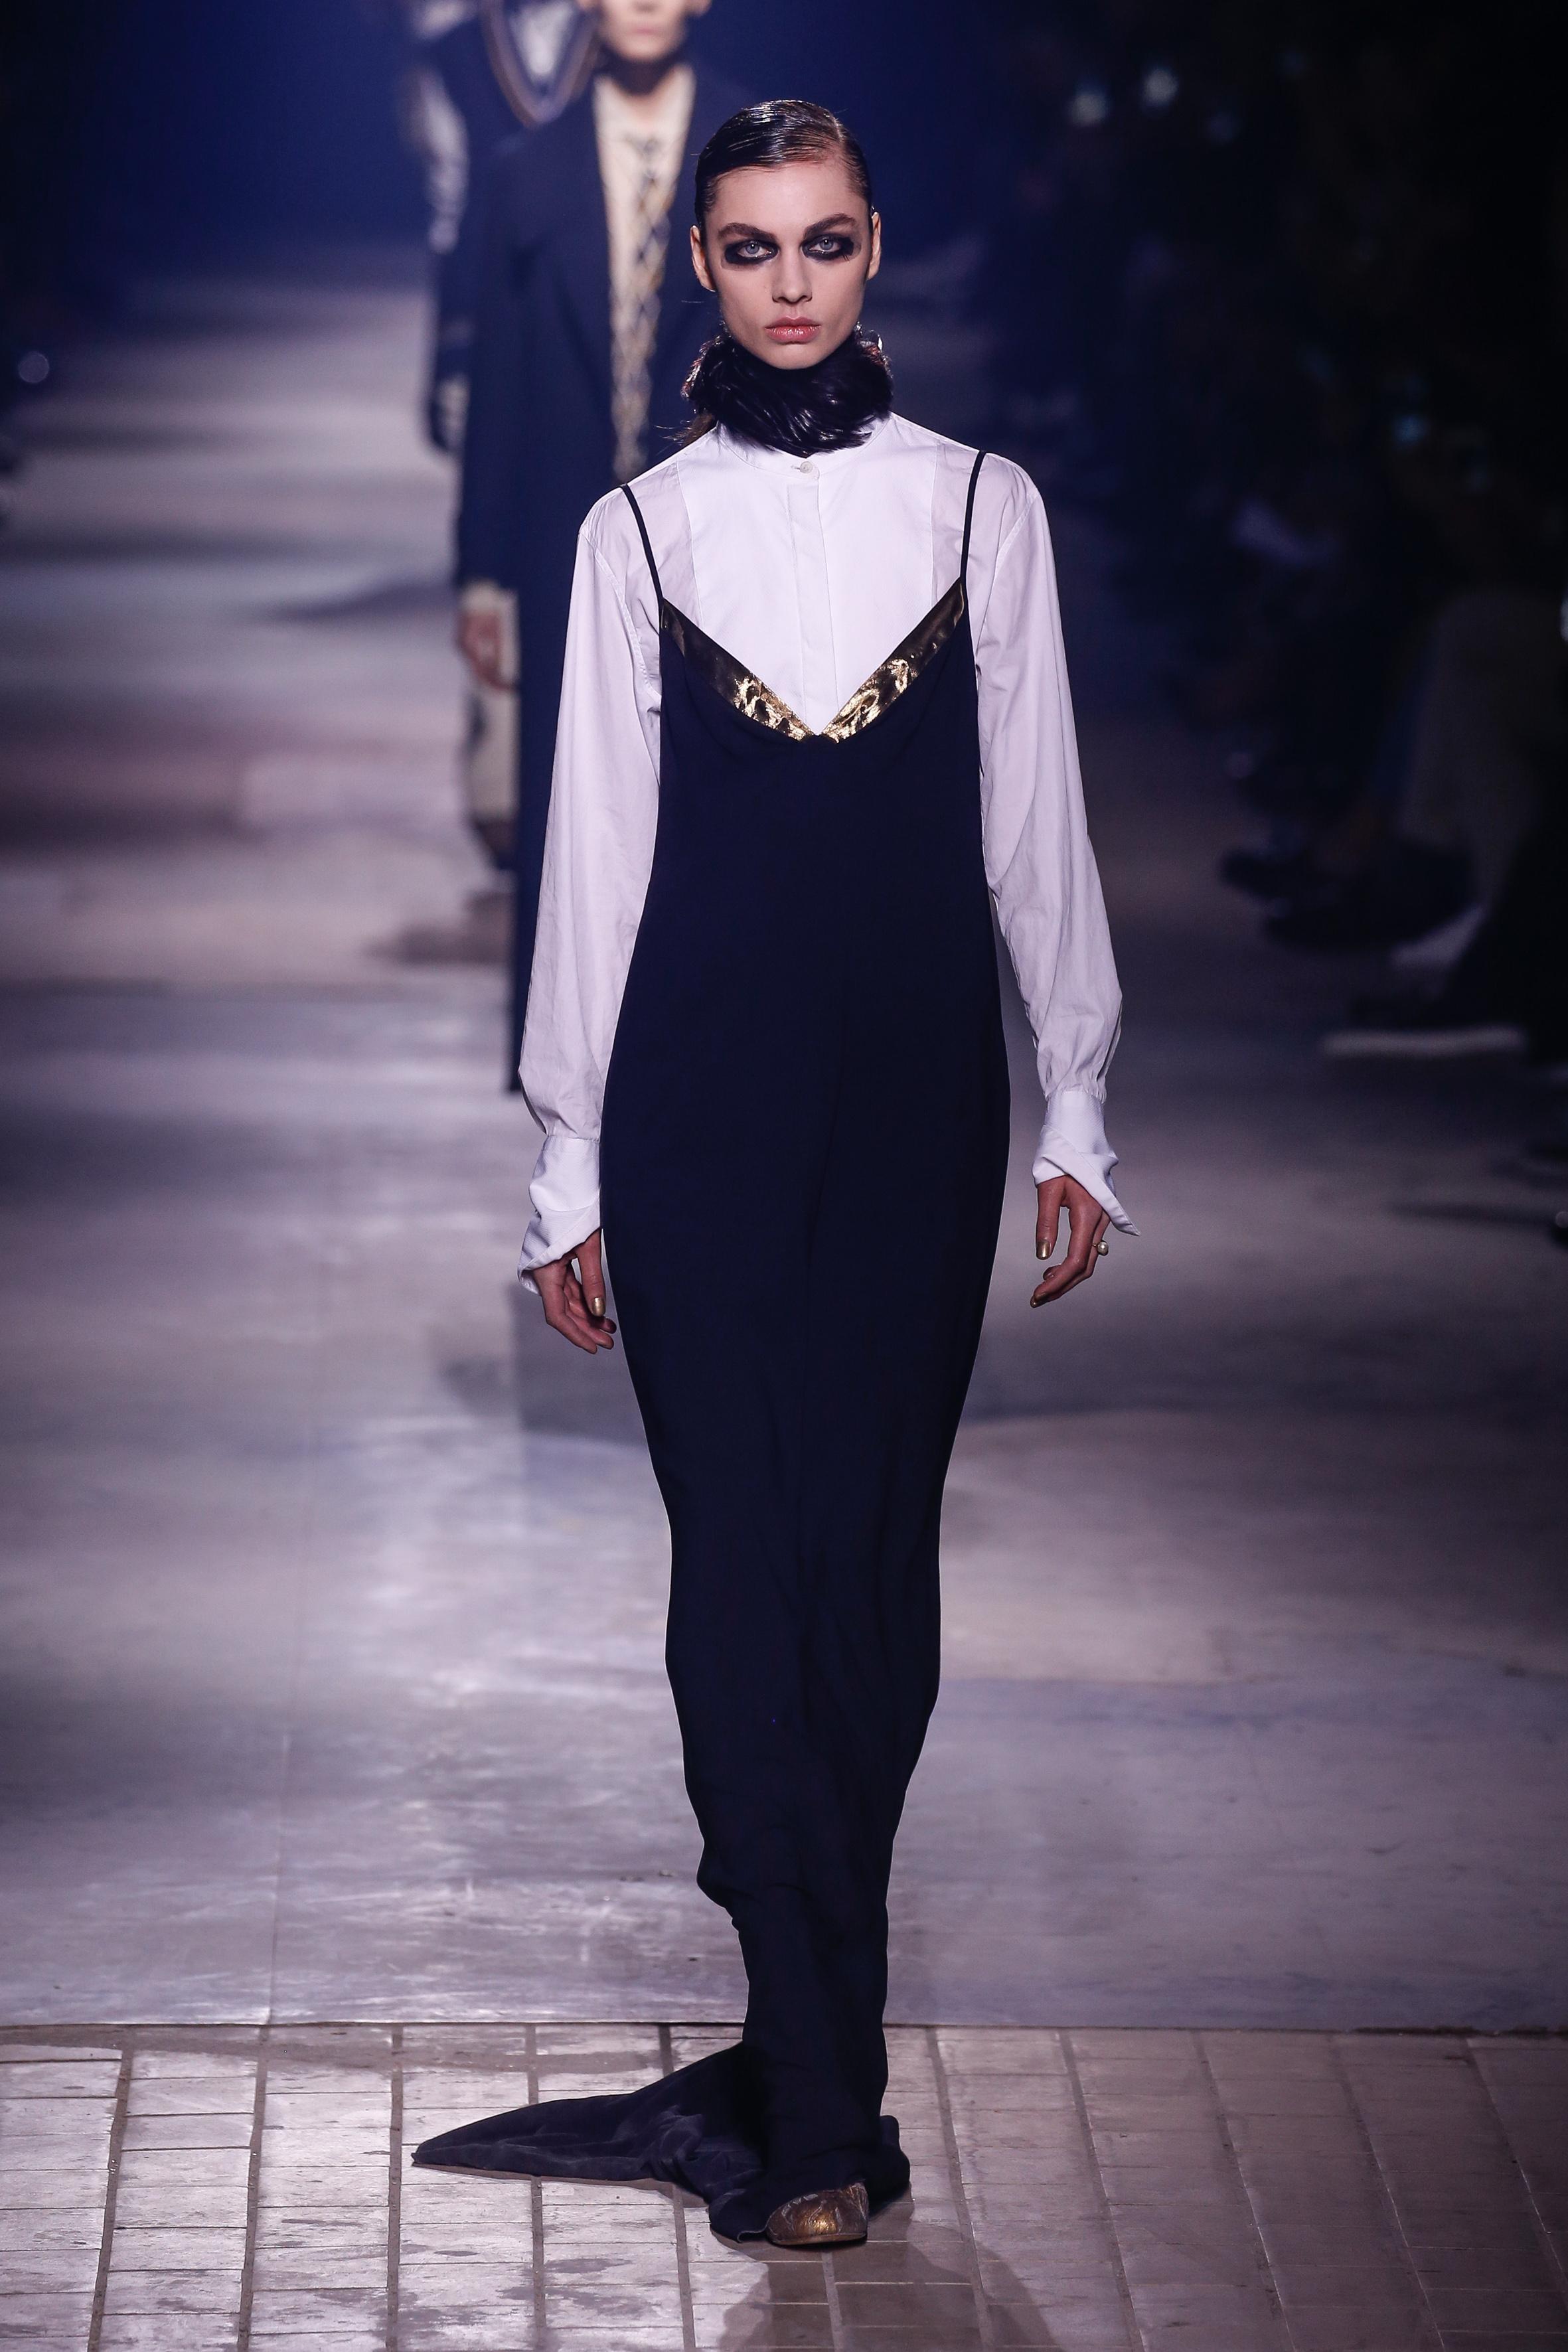 DRIES VAN NOTEN 오히려 블랙 드레스를 선택하고 슬릭한 화이트 셔츠로 슬쩍 드레스 코드를 지켜주는 센스.